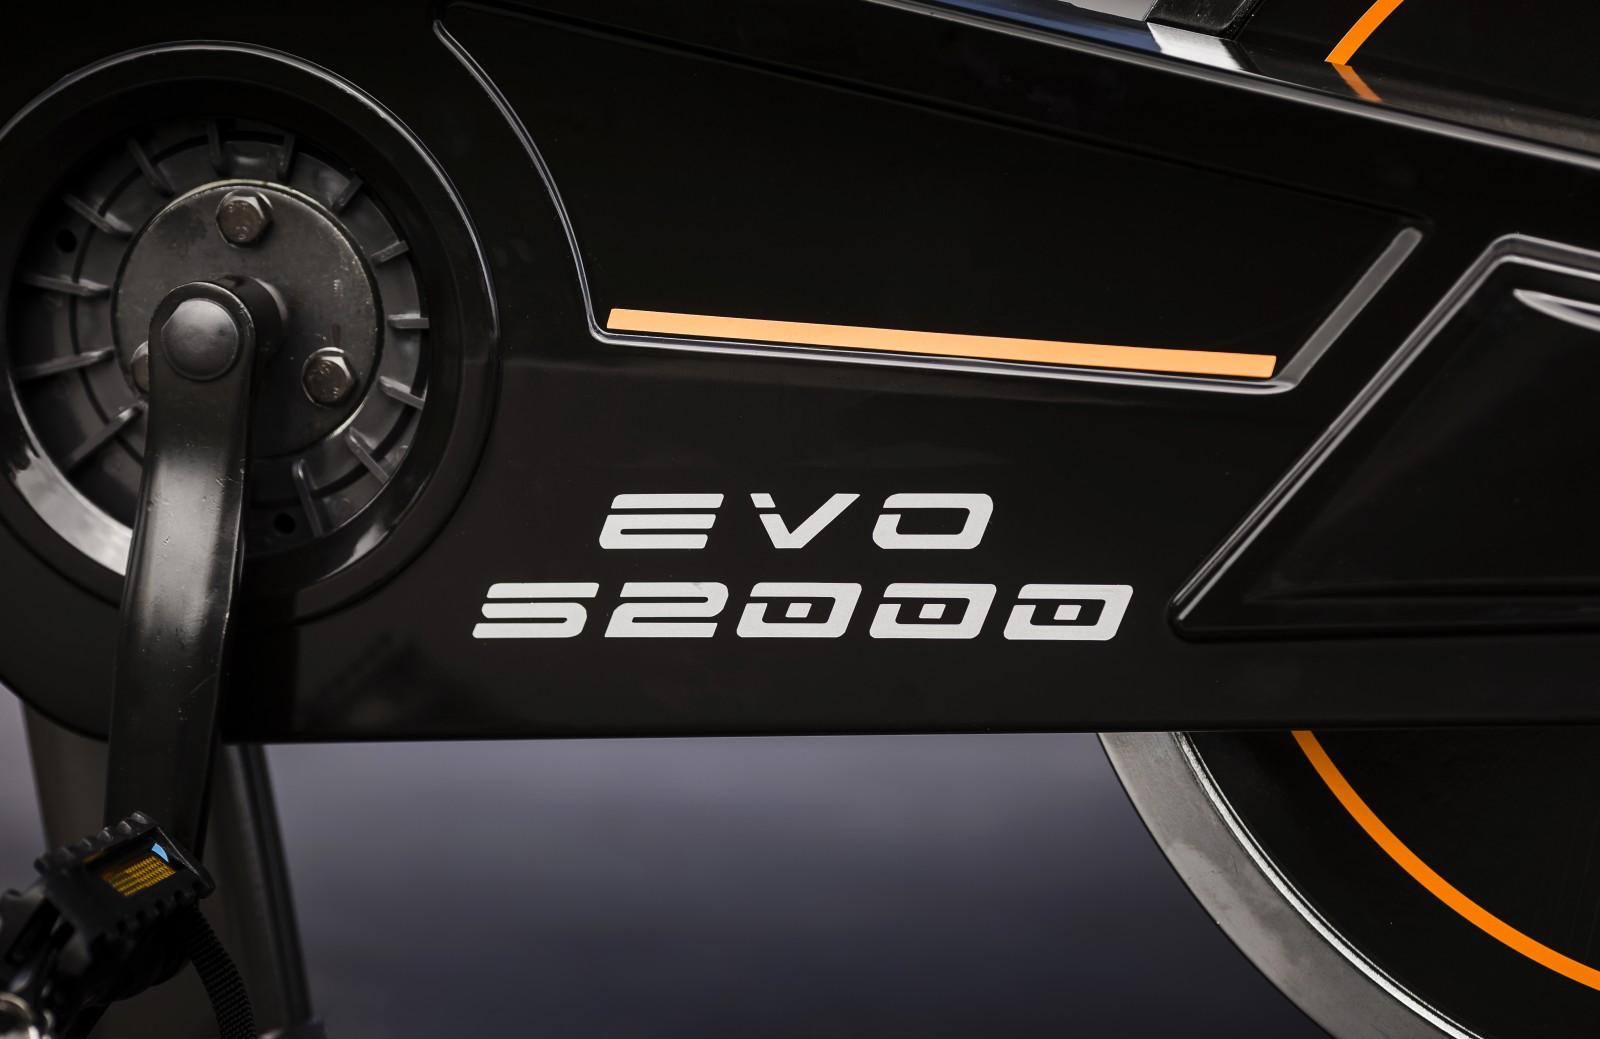 BH FITNESS EVO S2000